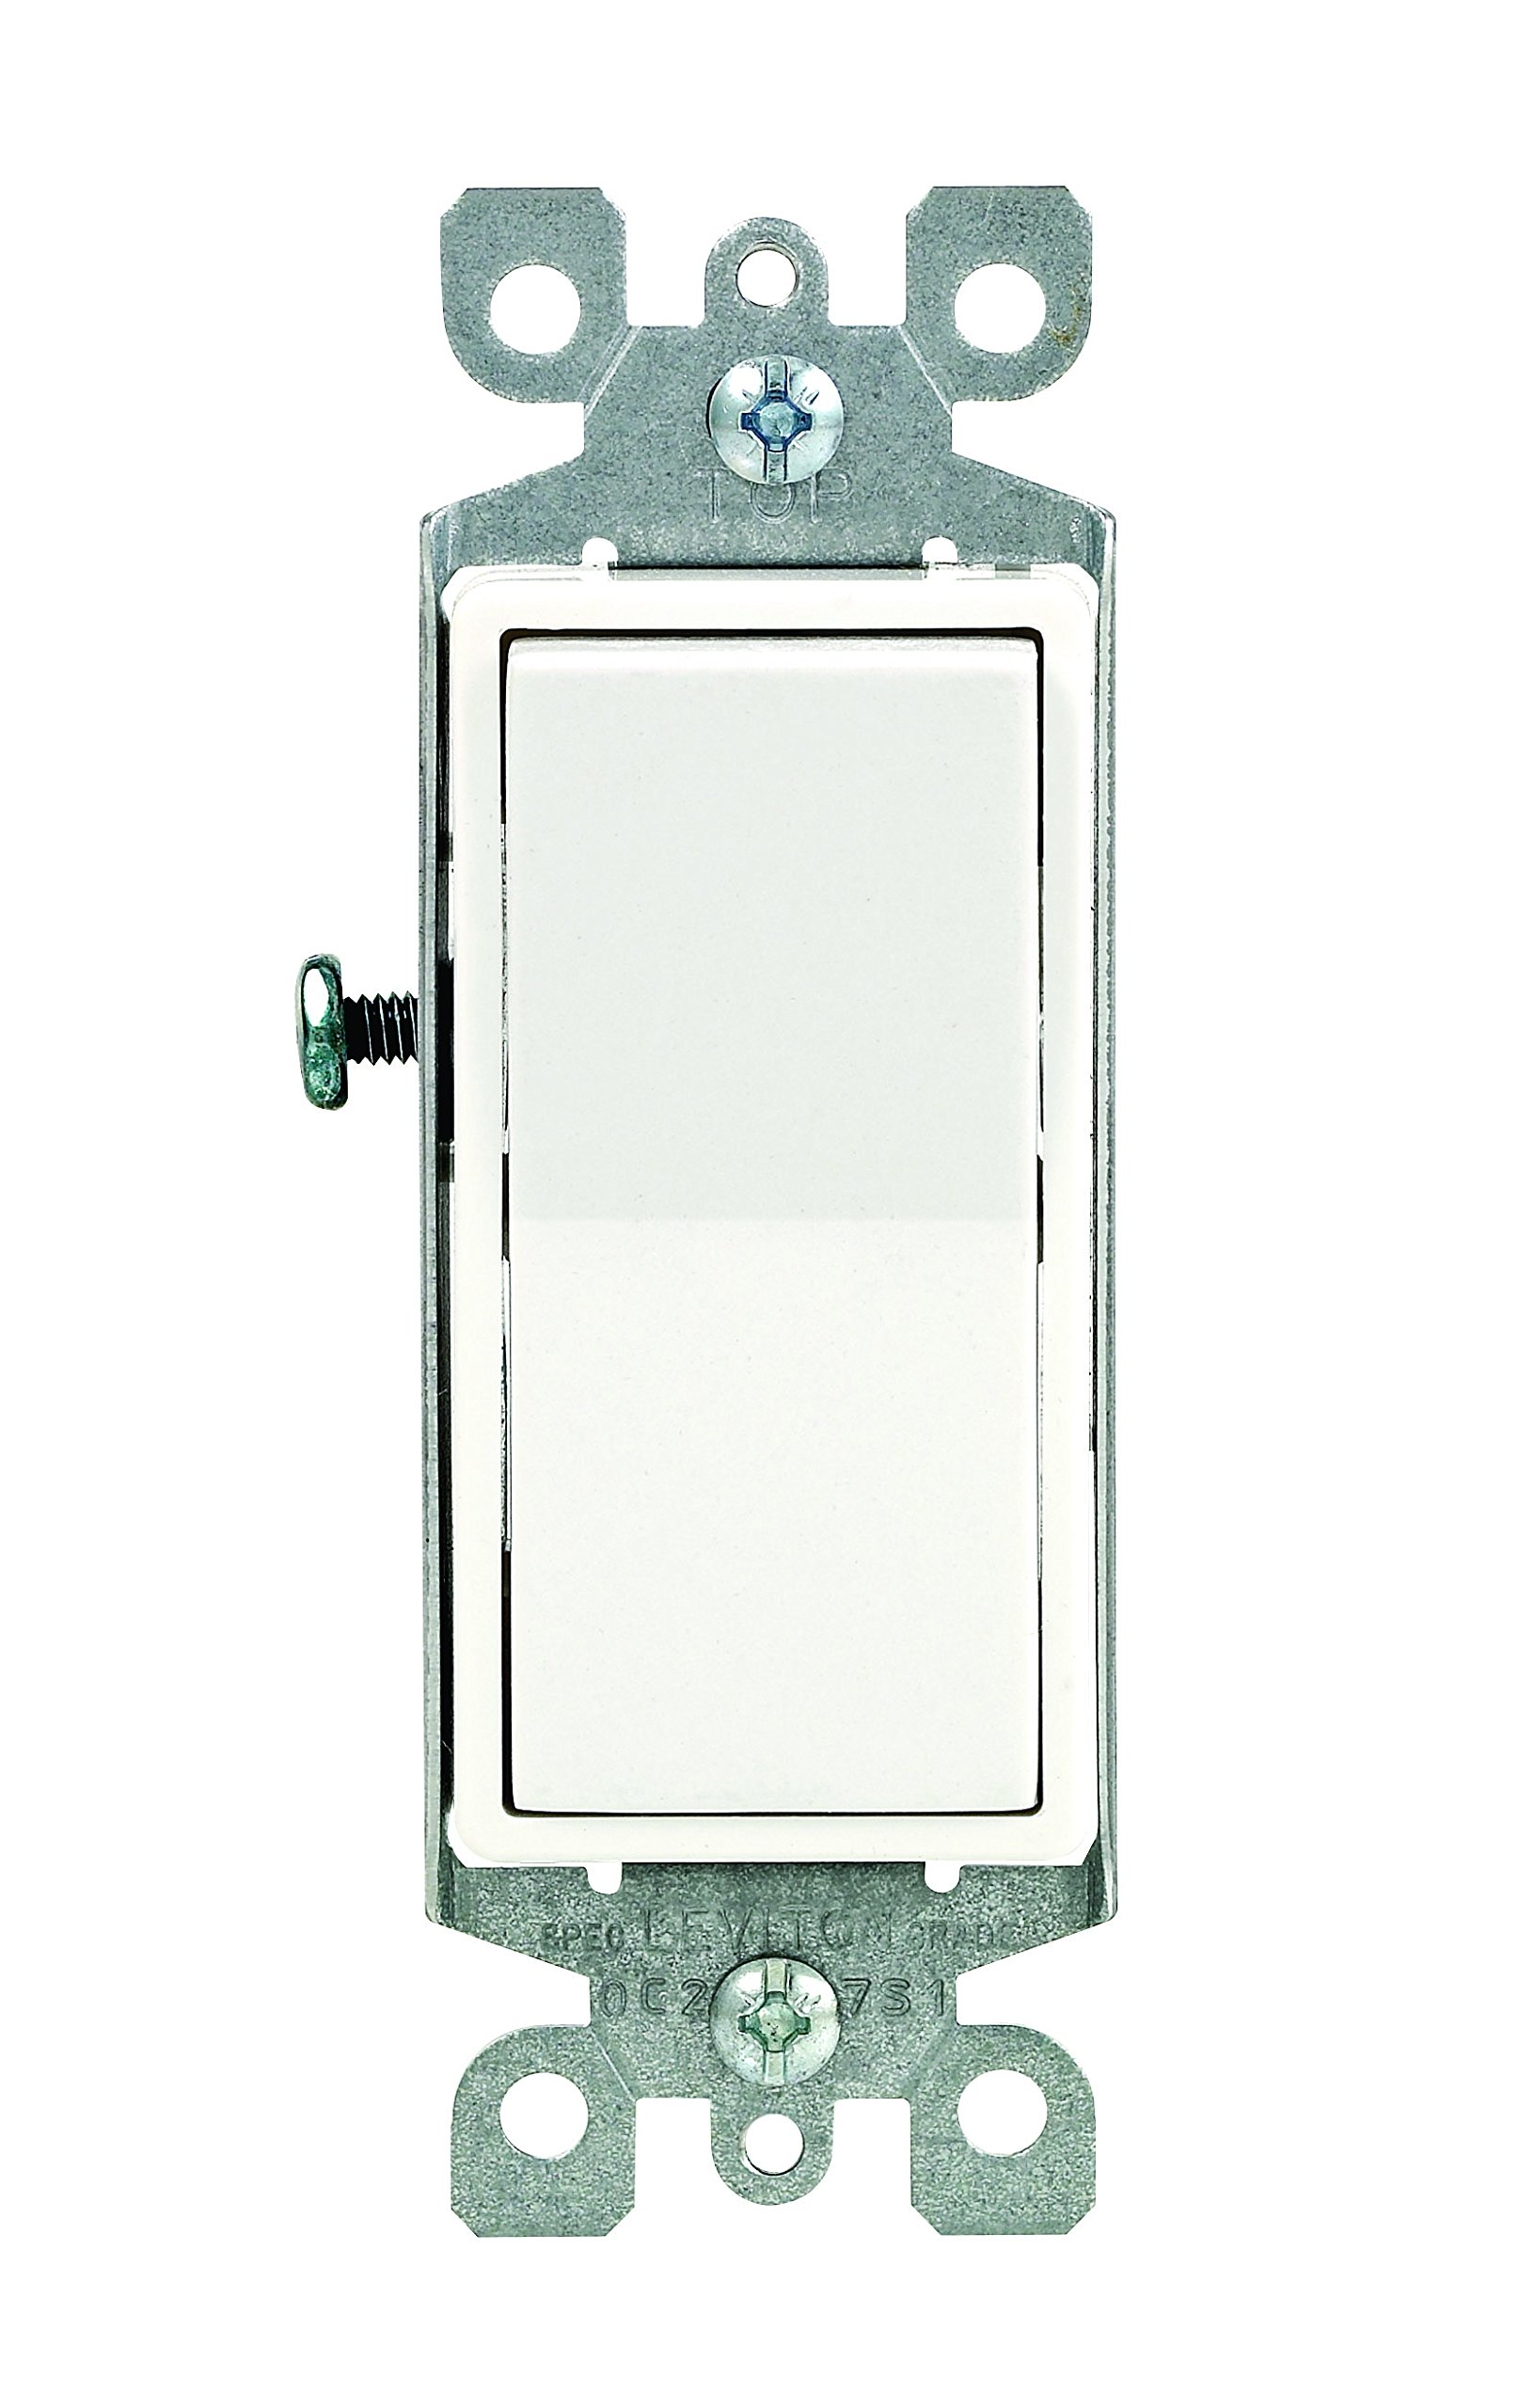 Leviton 5601-2WM 15 Amp, 120/277 Volt, Decora Rocker Single-Pole AC Quiet Switch, Residential Grade, Grounding, 10-Pack, White by Leviton